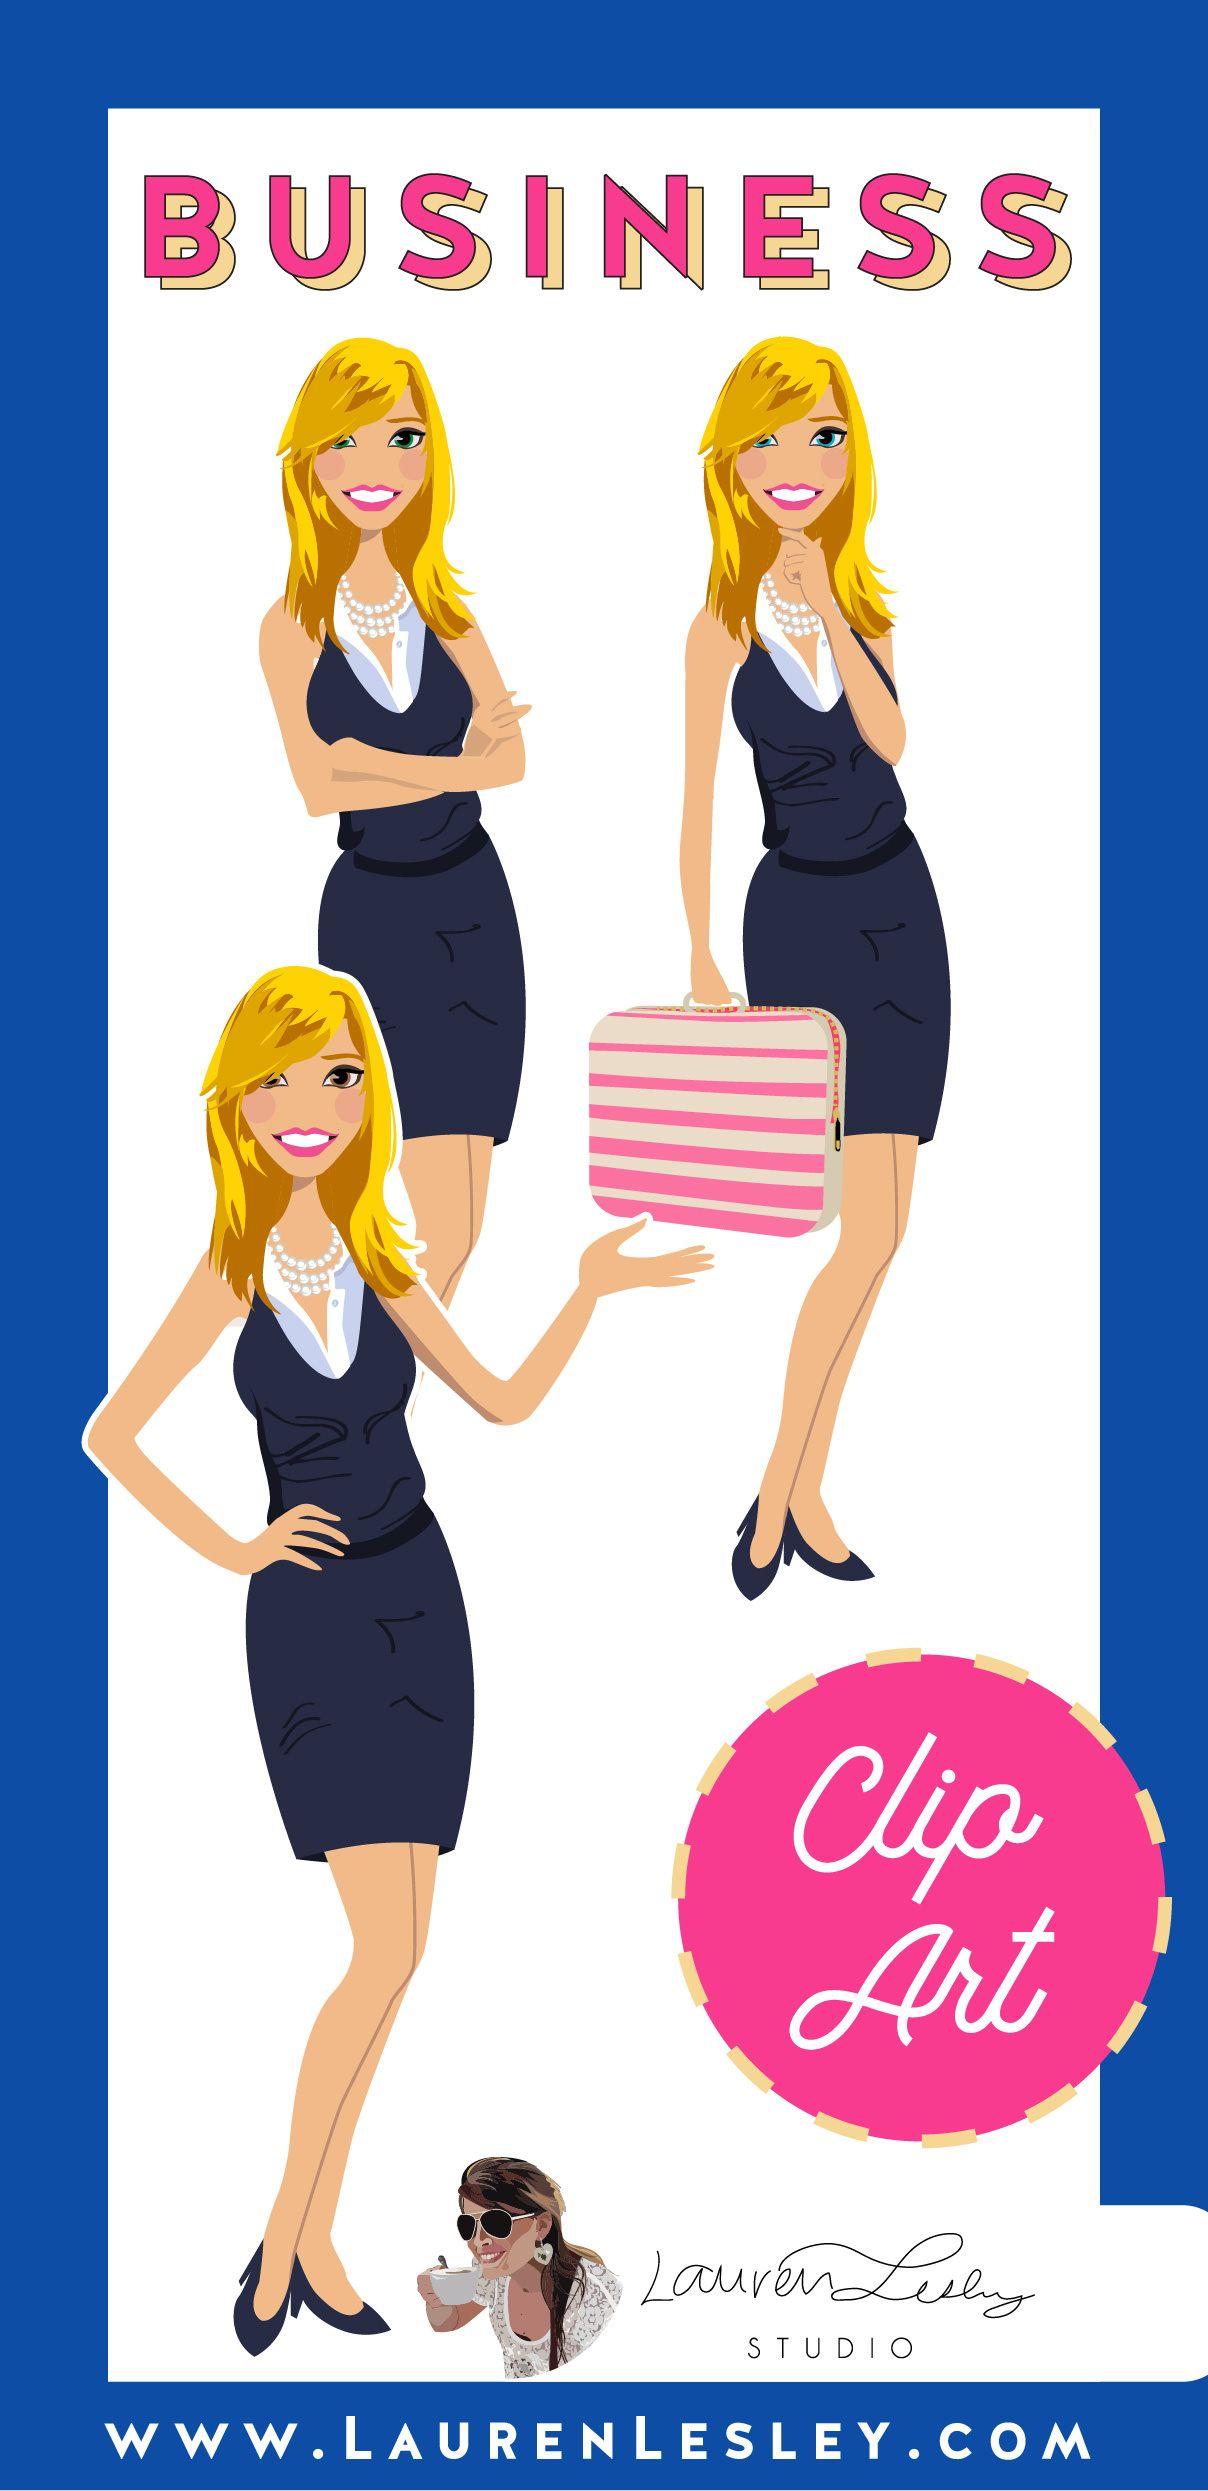 Business Clip Art Daisy Logo young, Clip art